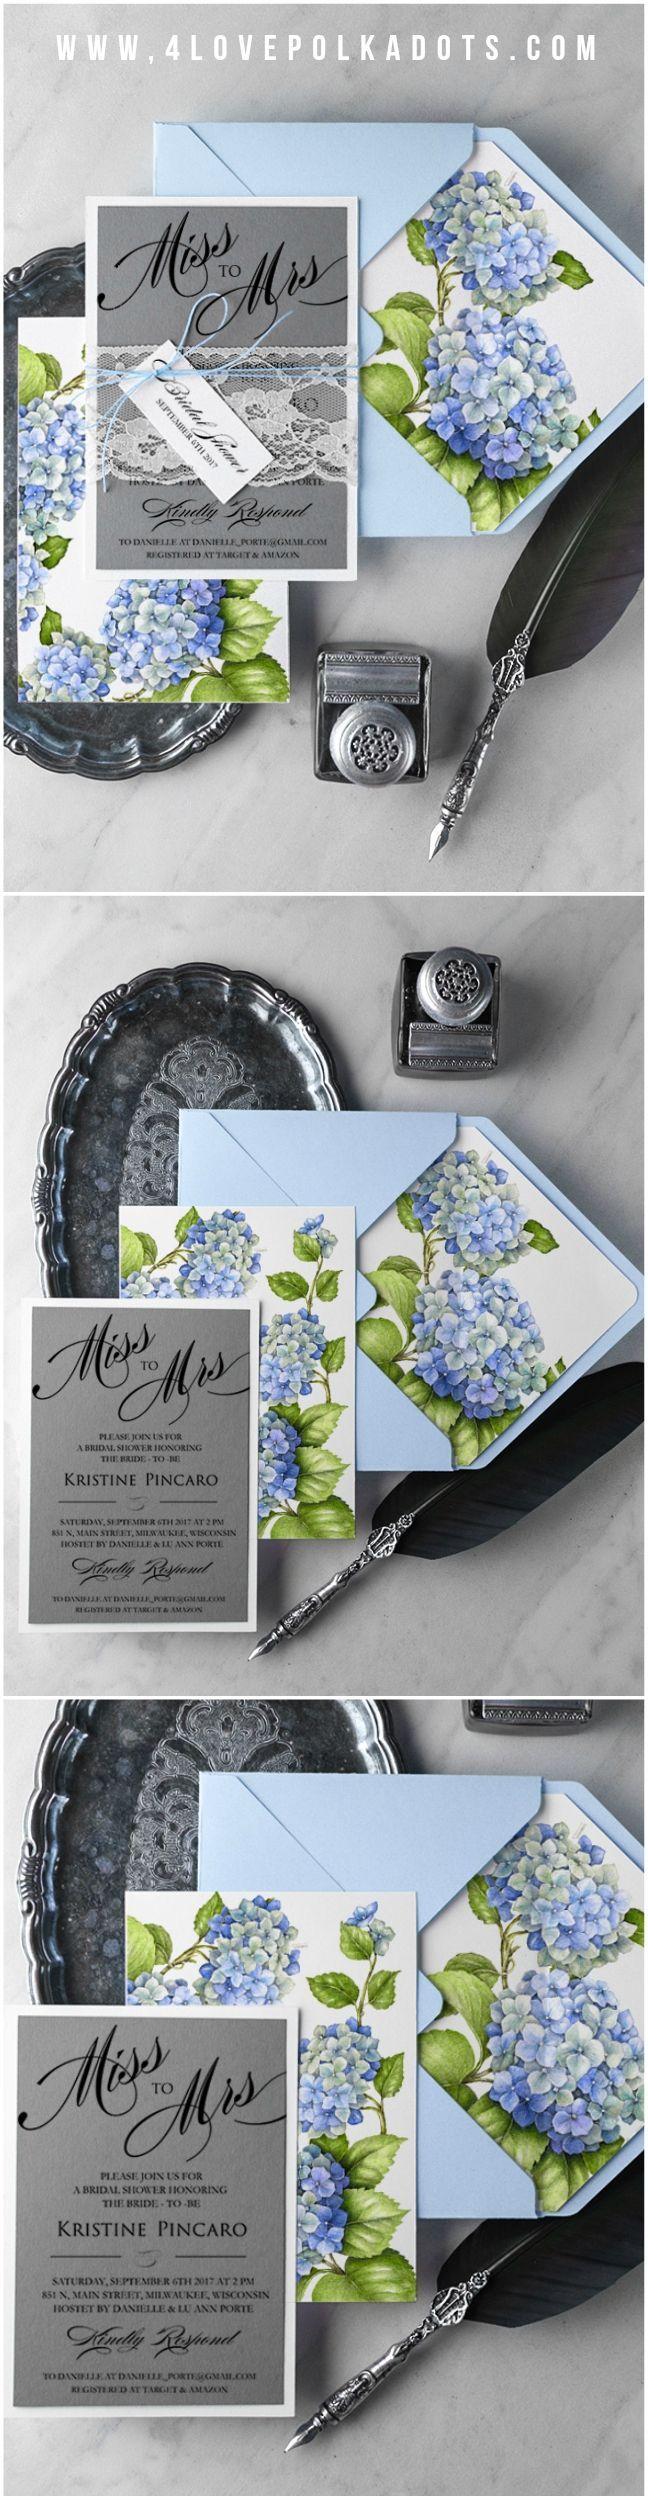 Purple hydrangea wedding invitation sample - Blue Hydrangea Floral Bridal Shower Invitations Bluewedding Hydrangea Floral Flowers Weddingideas